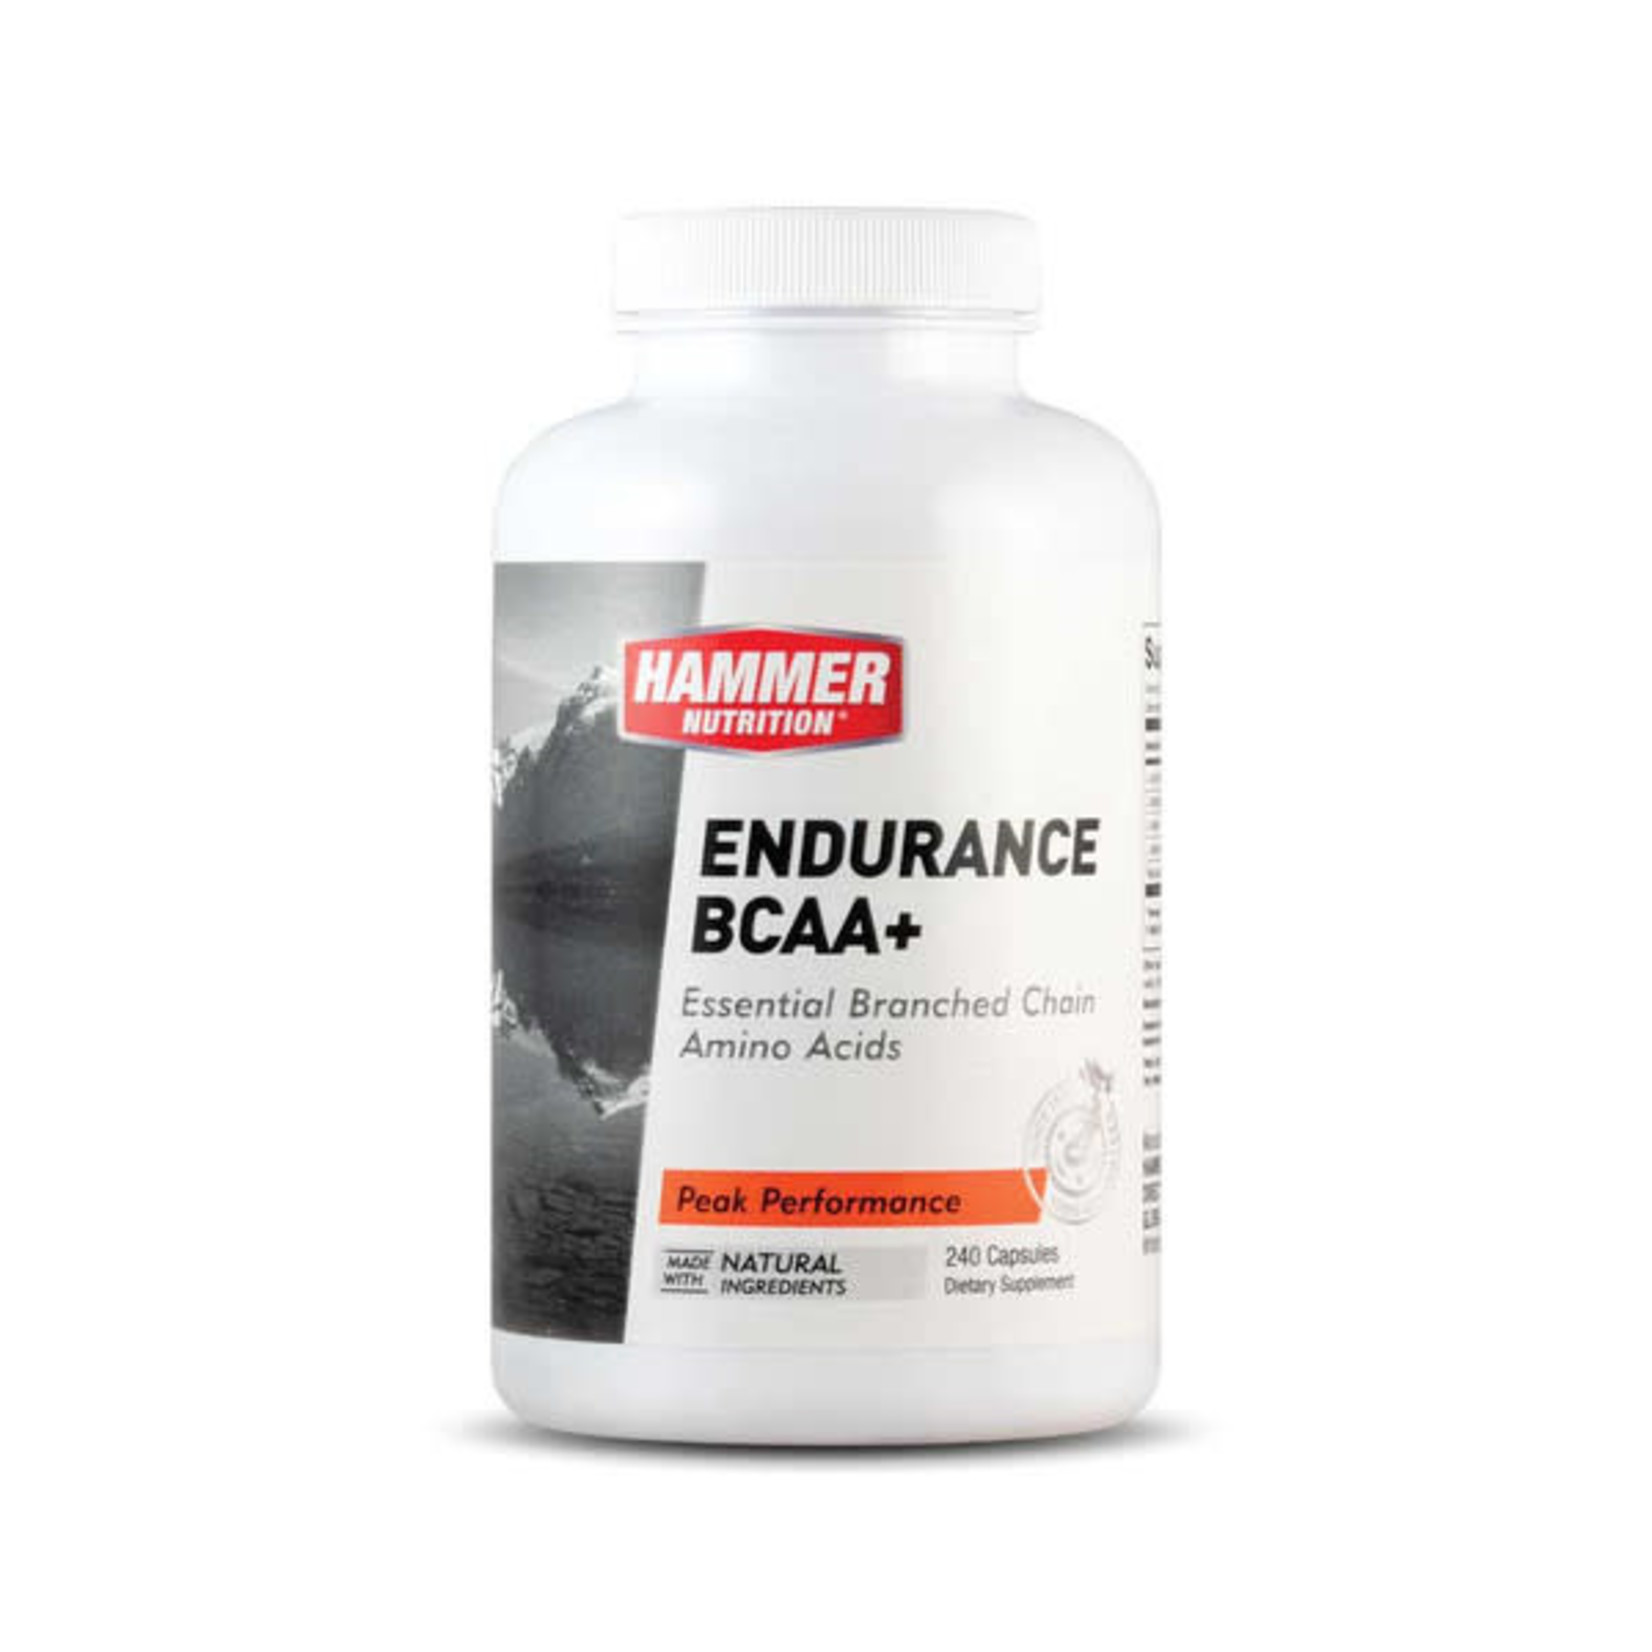 Hammer Nutrition Hammer Endurance BCAA+ 120 capsules